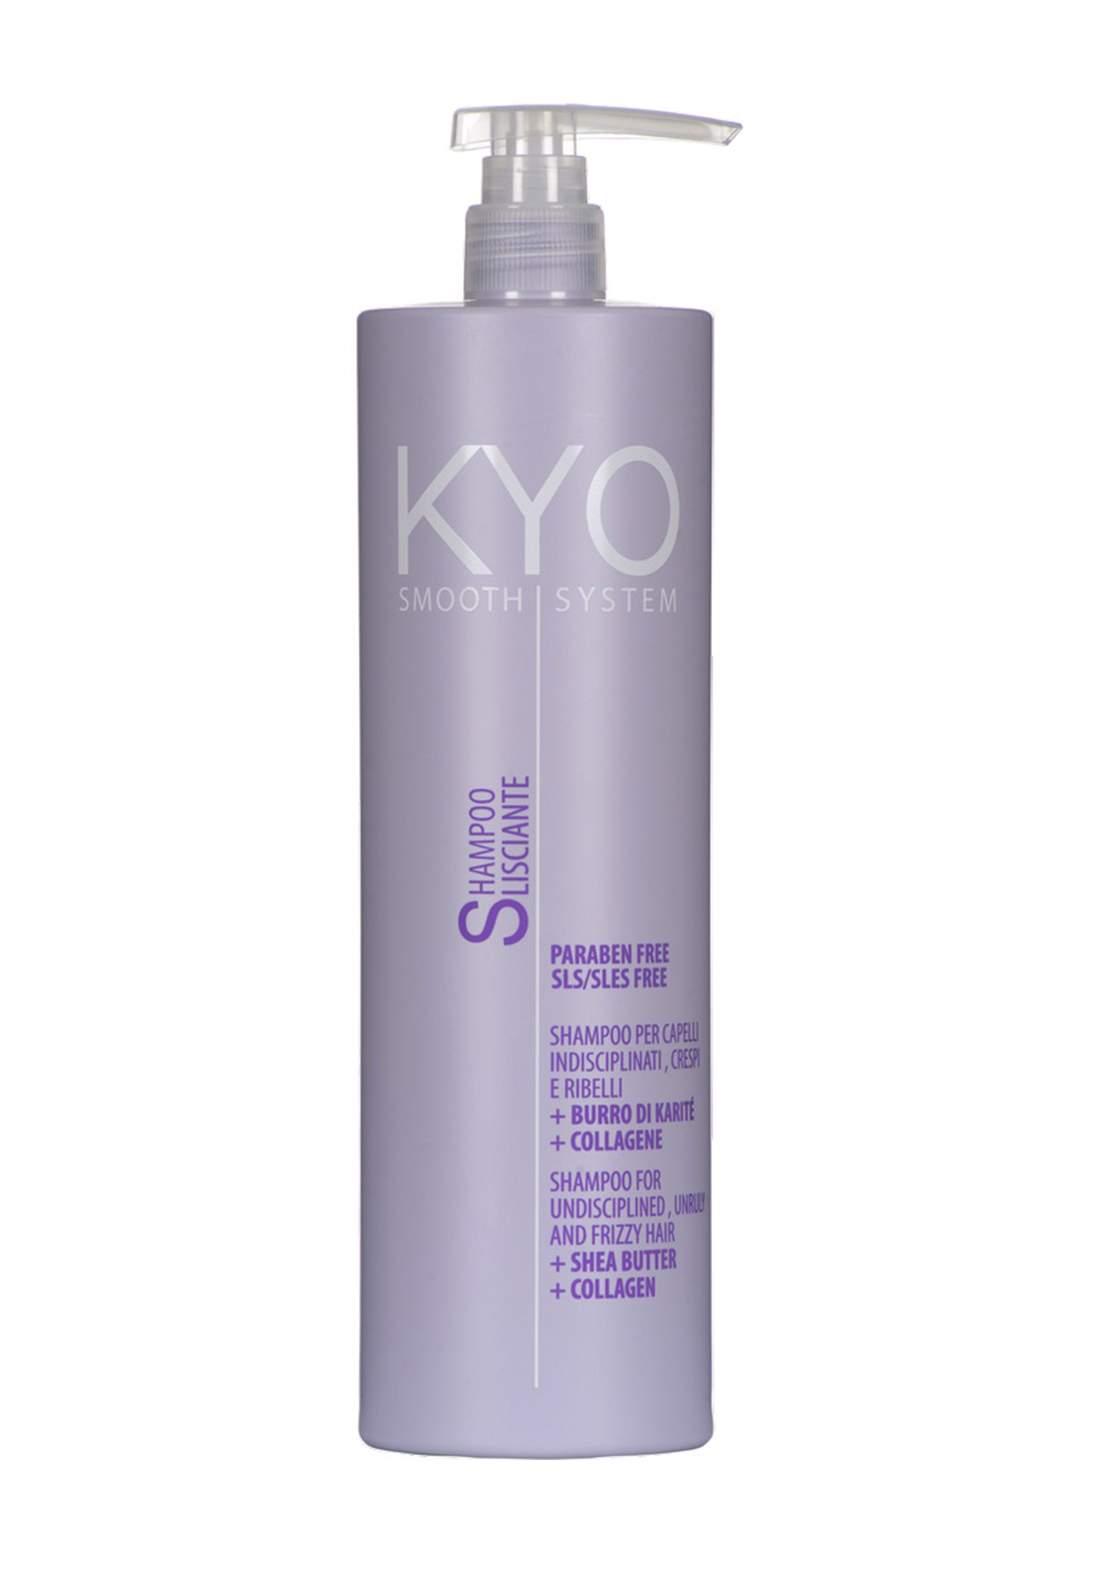 Kyo Styling Spray KYSM07 200 ml - Purple سبري منعم للشعر